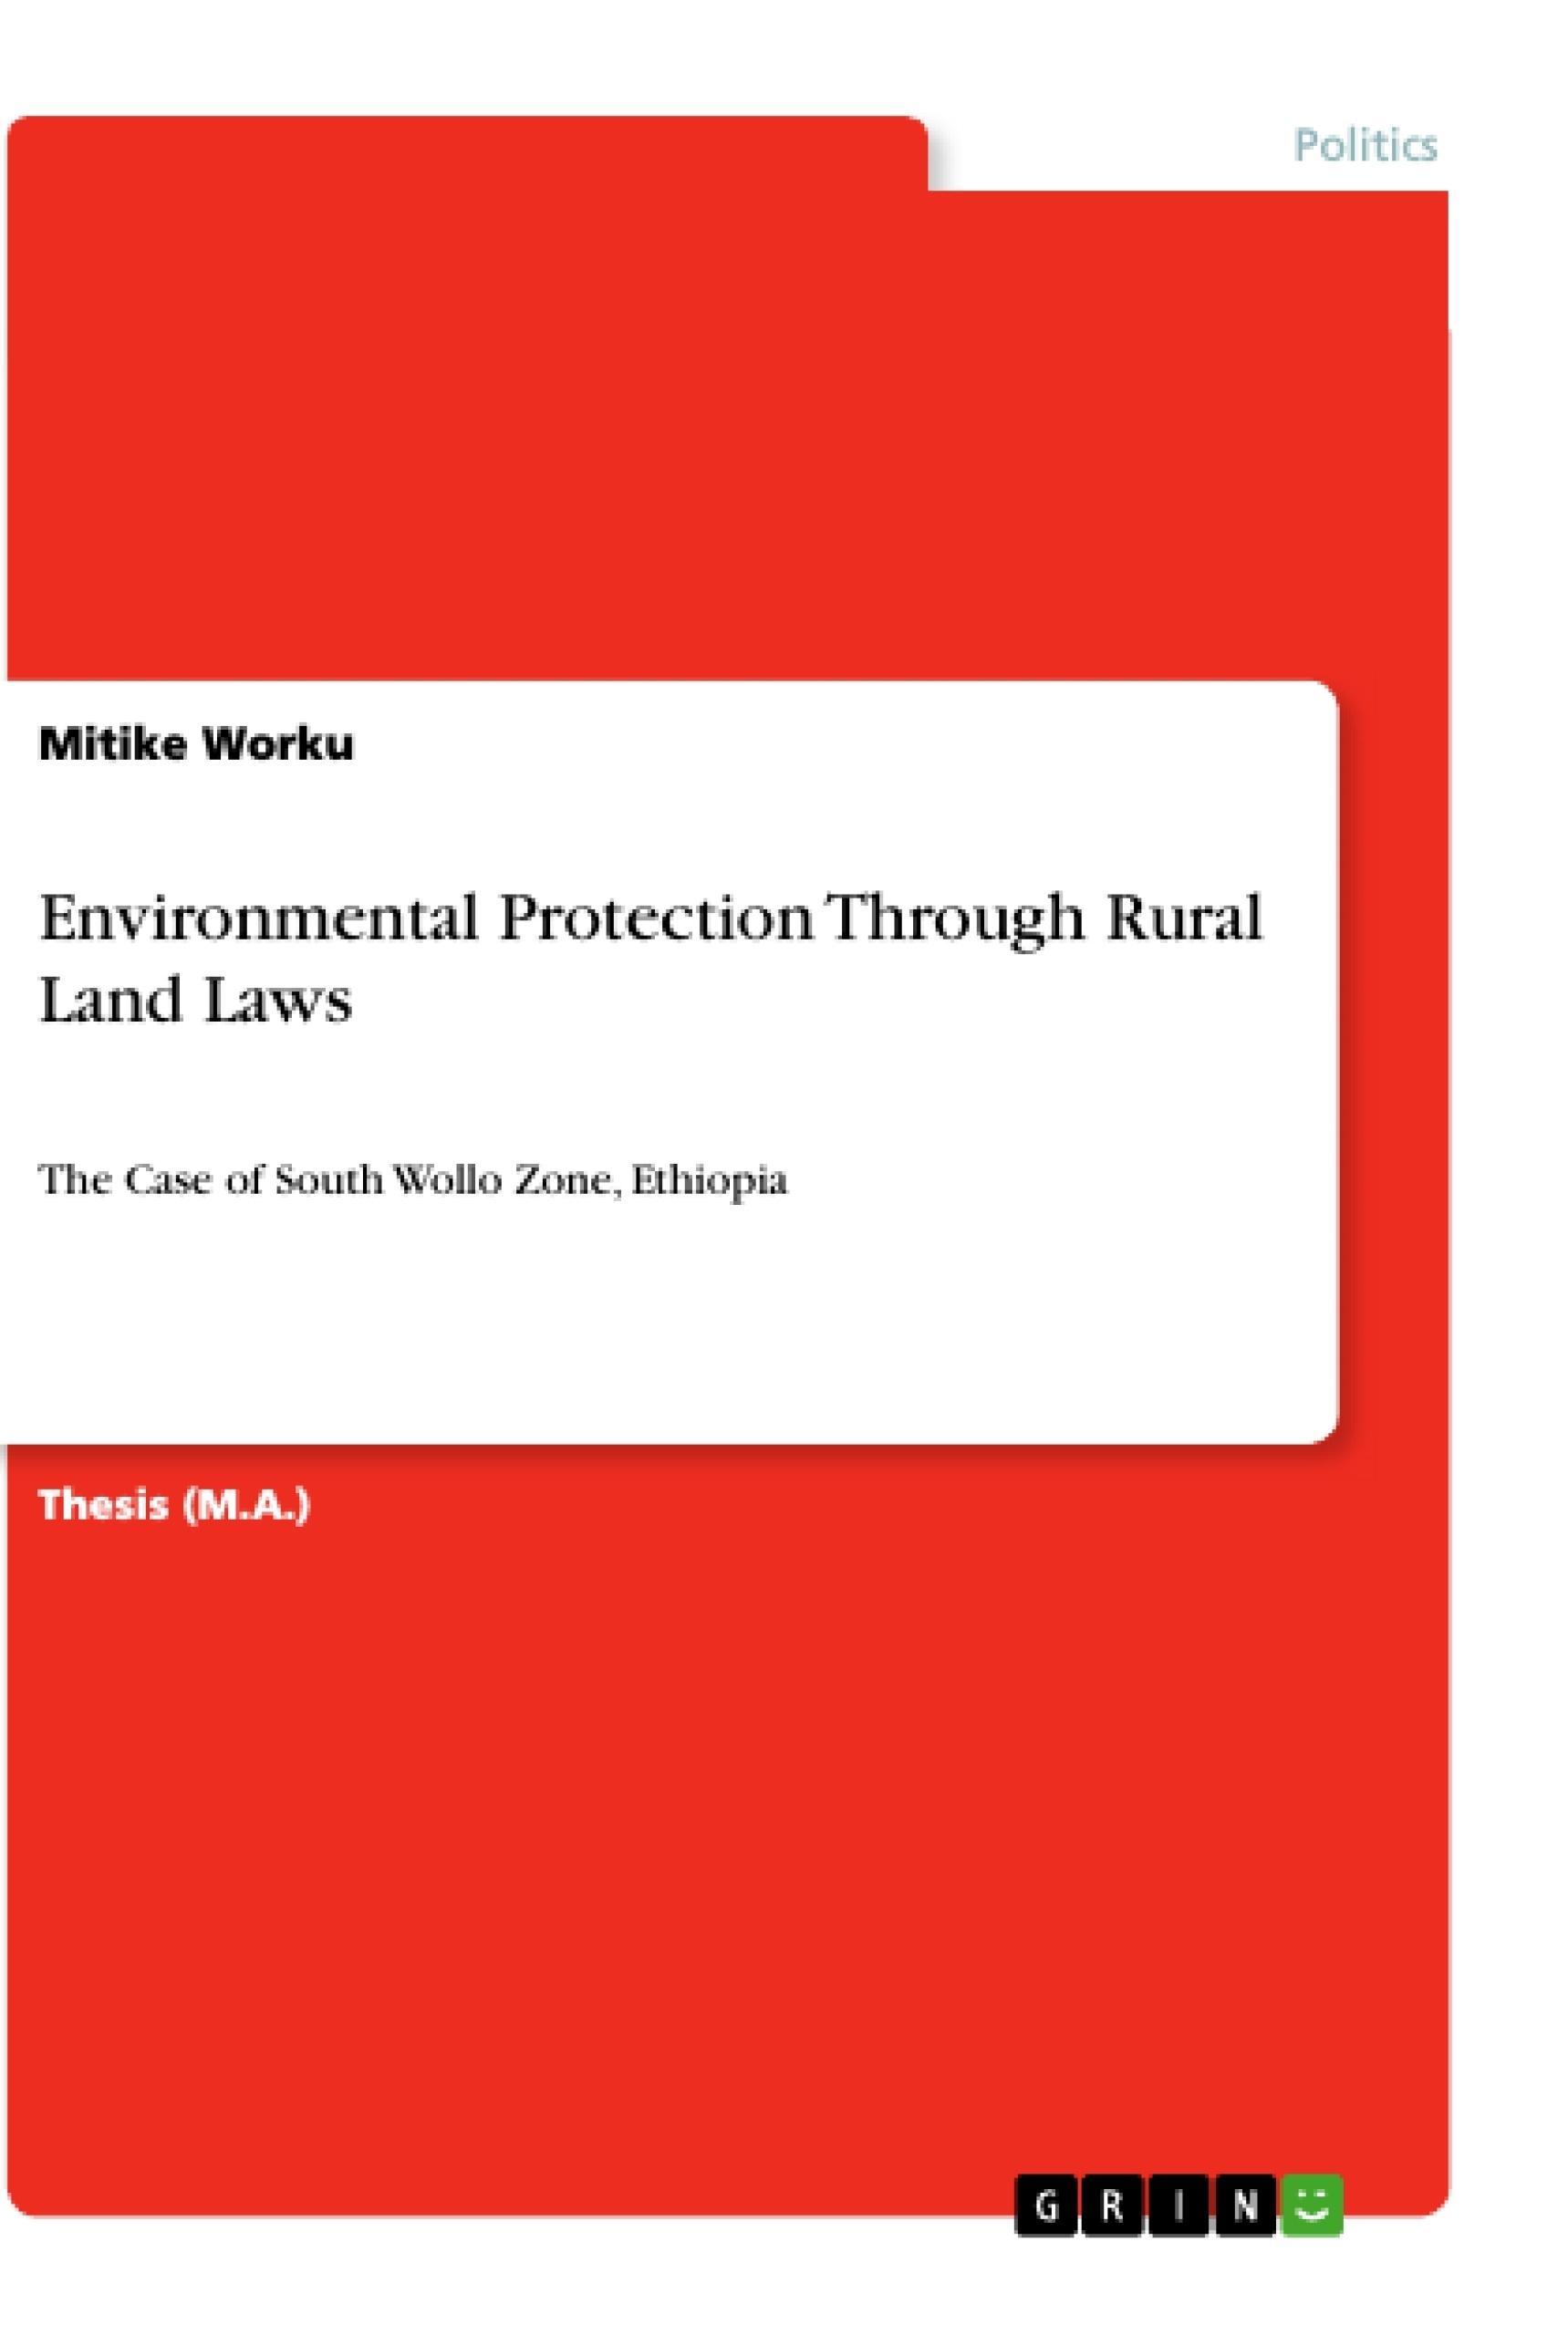 Title: Environmental Protection Through Rural Land Laws